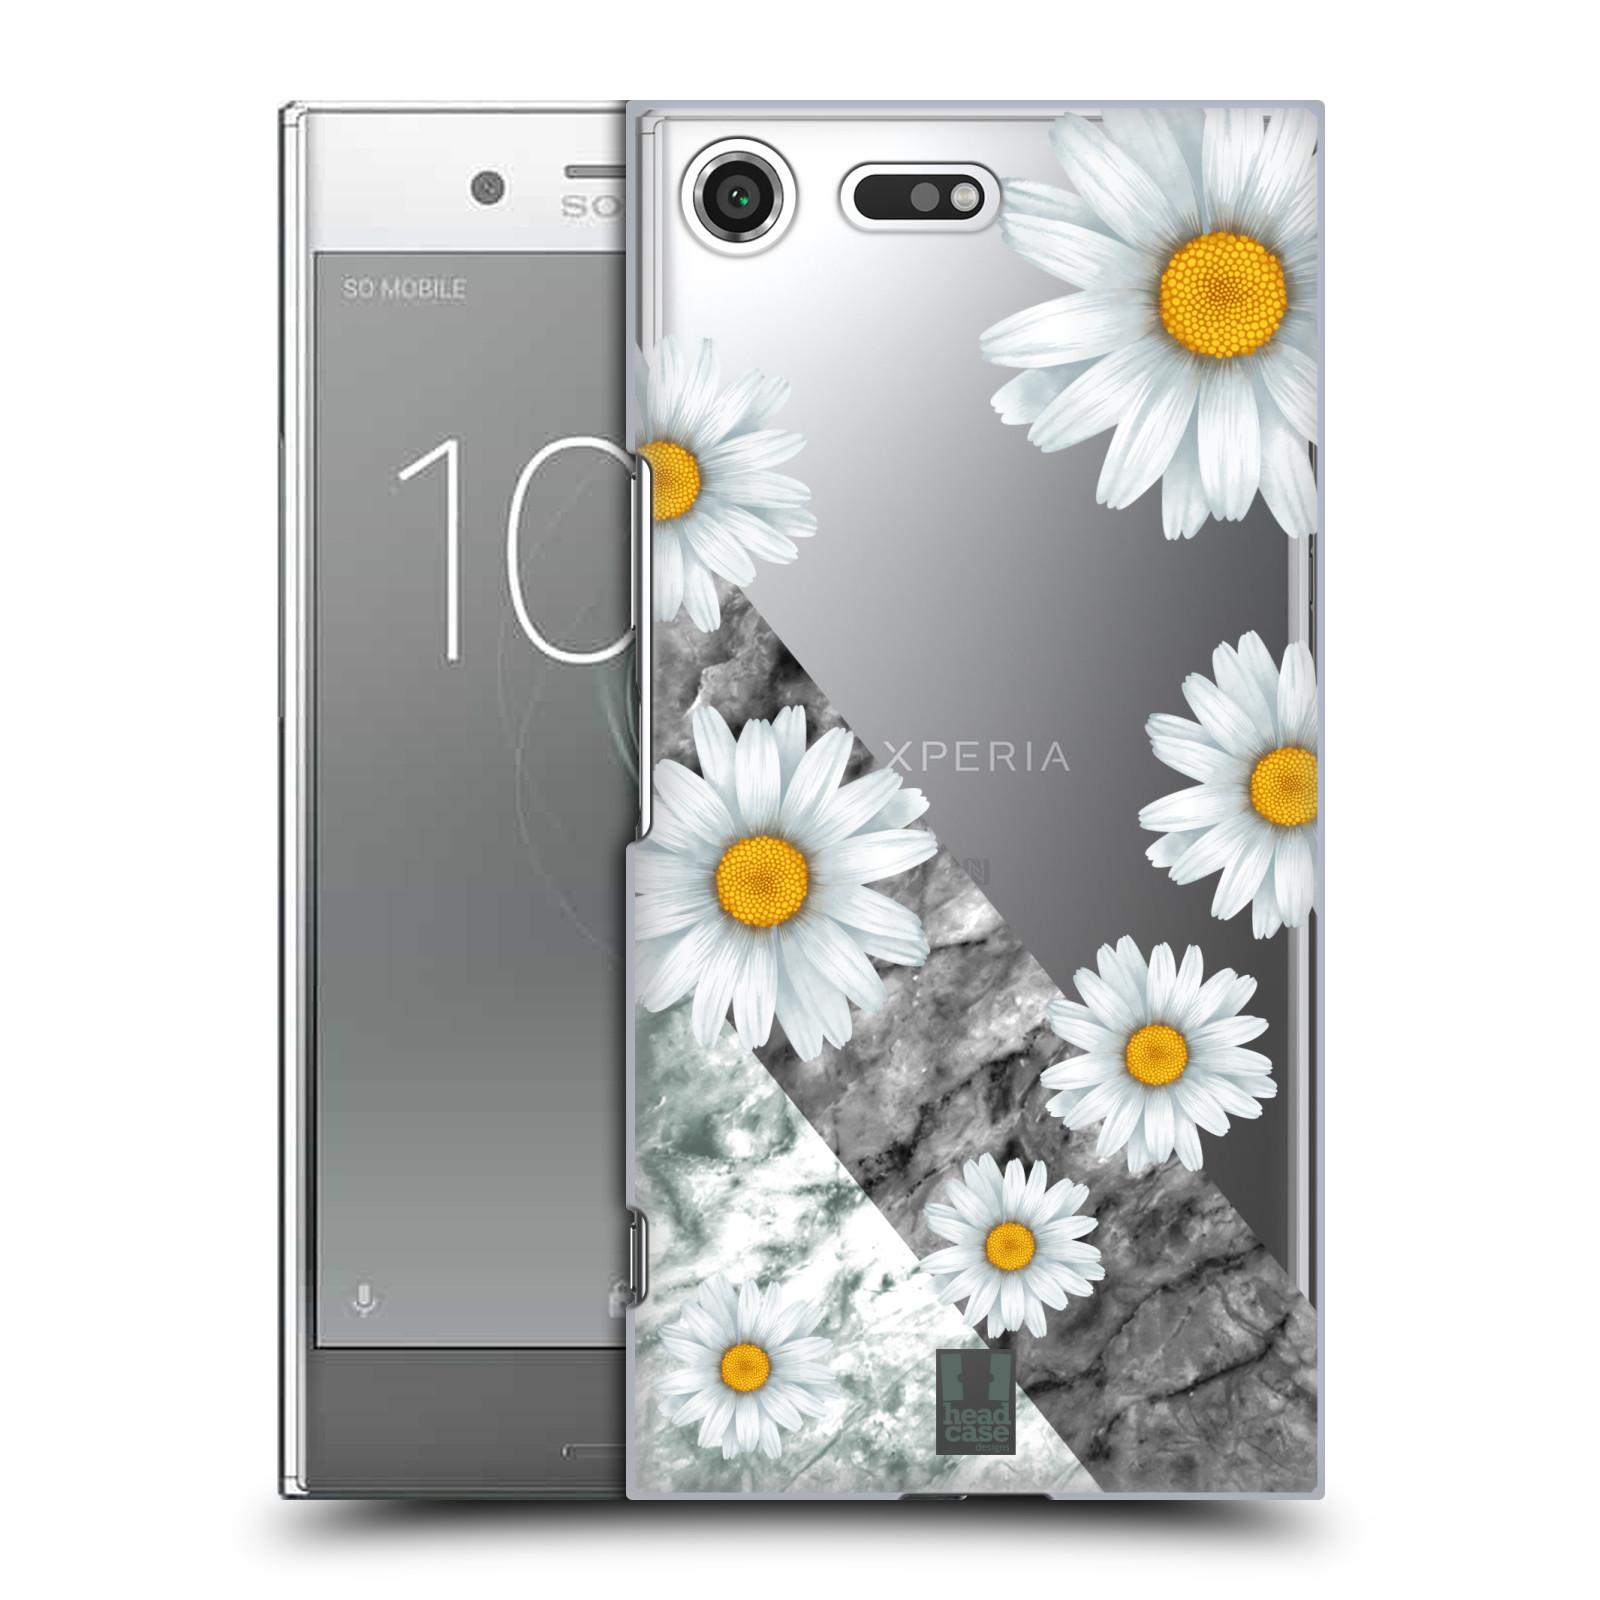 Plastové pouzdro na mobil Sony Xperia XZ Premium Head Case - Kopretiny a mramor